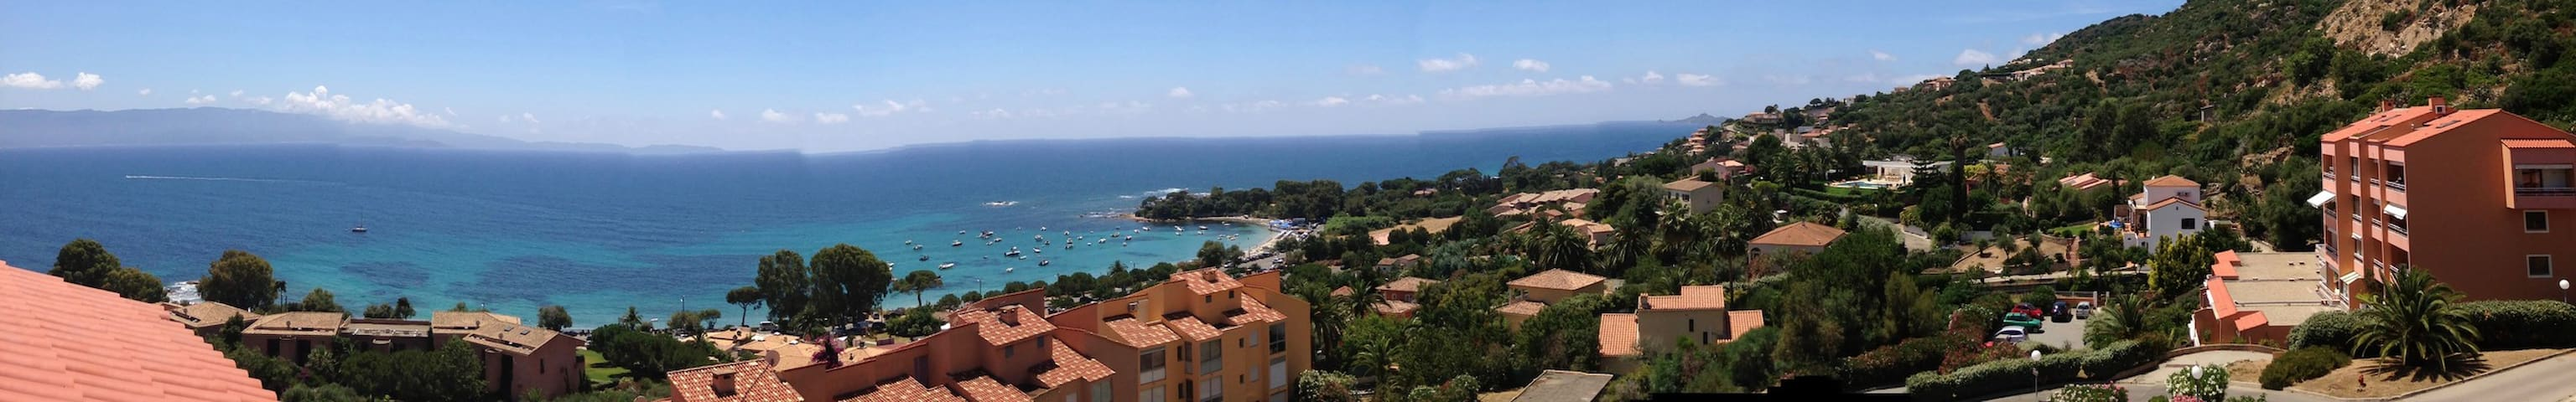 Studio, beautiful terrace facing sea near beaches